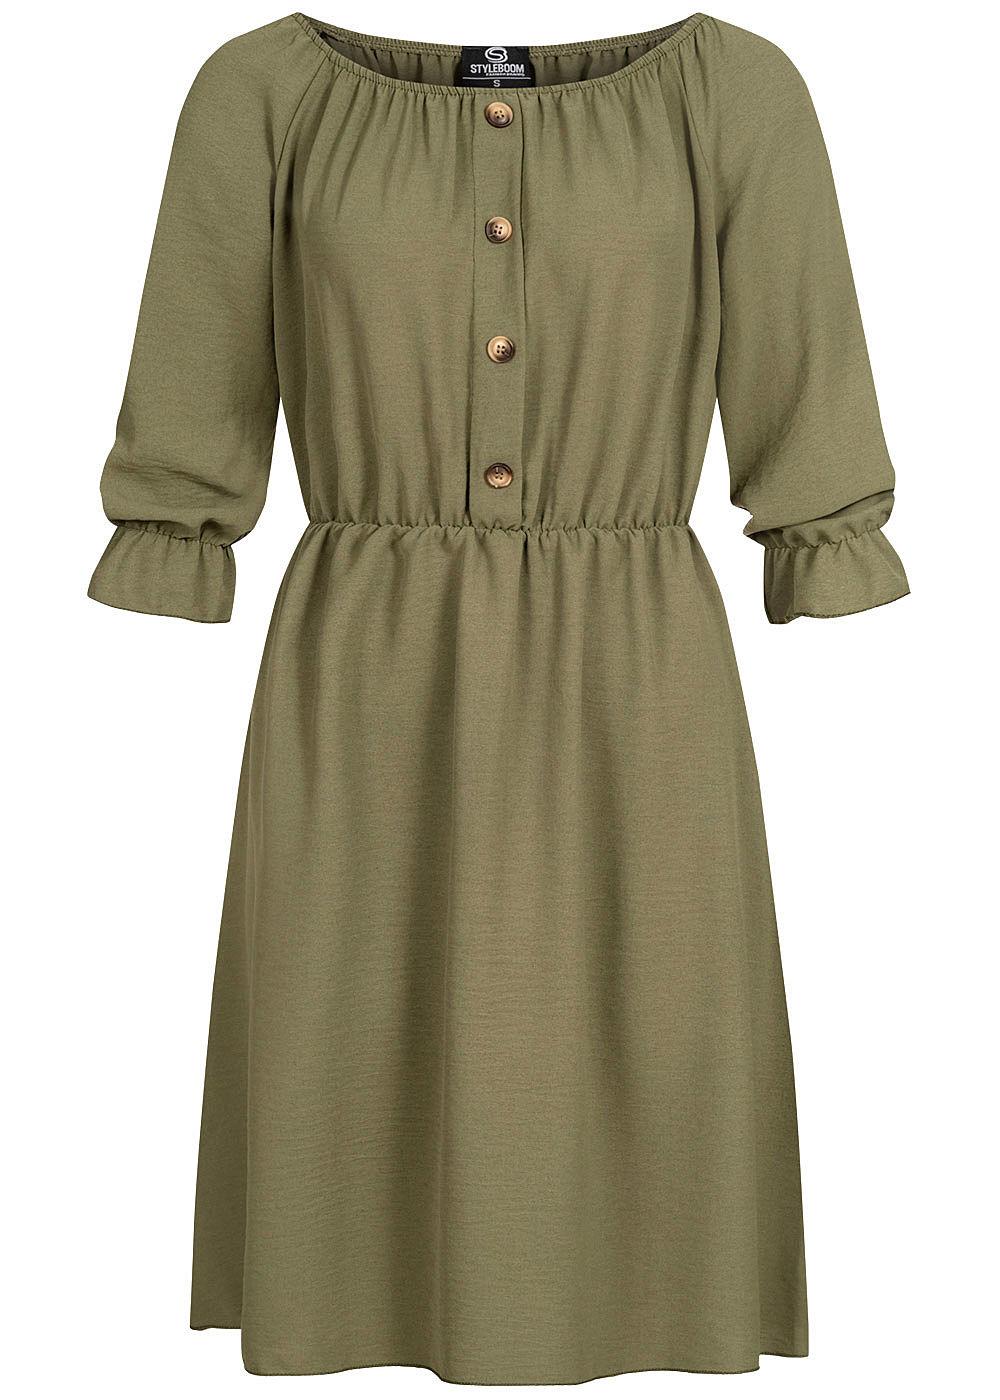 Styleboom Fashion Damen Mini Kleid Deko Knopfleiste khaki grün